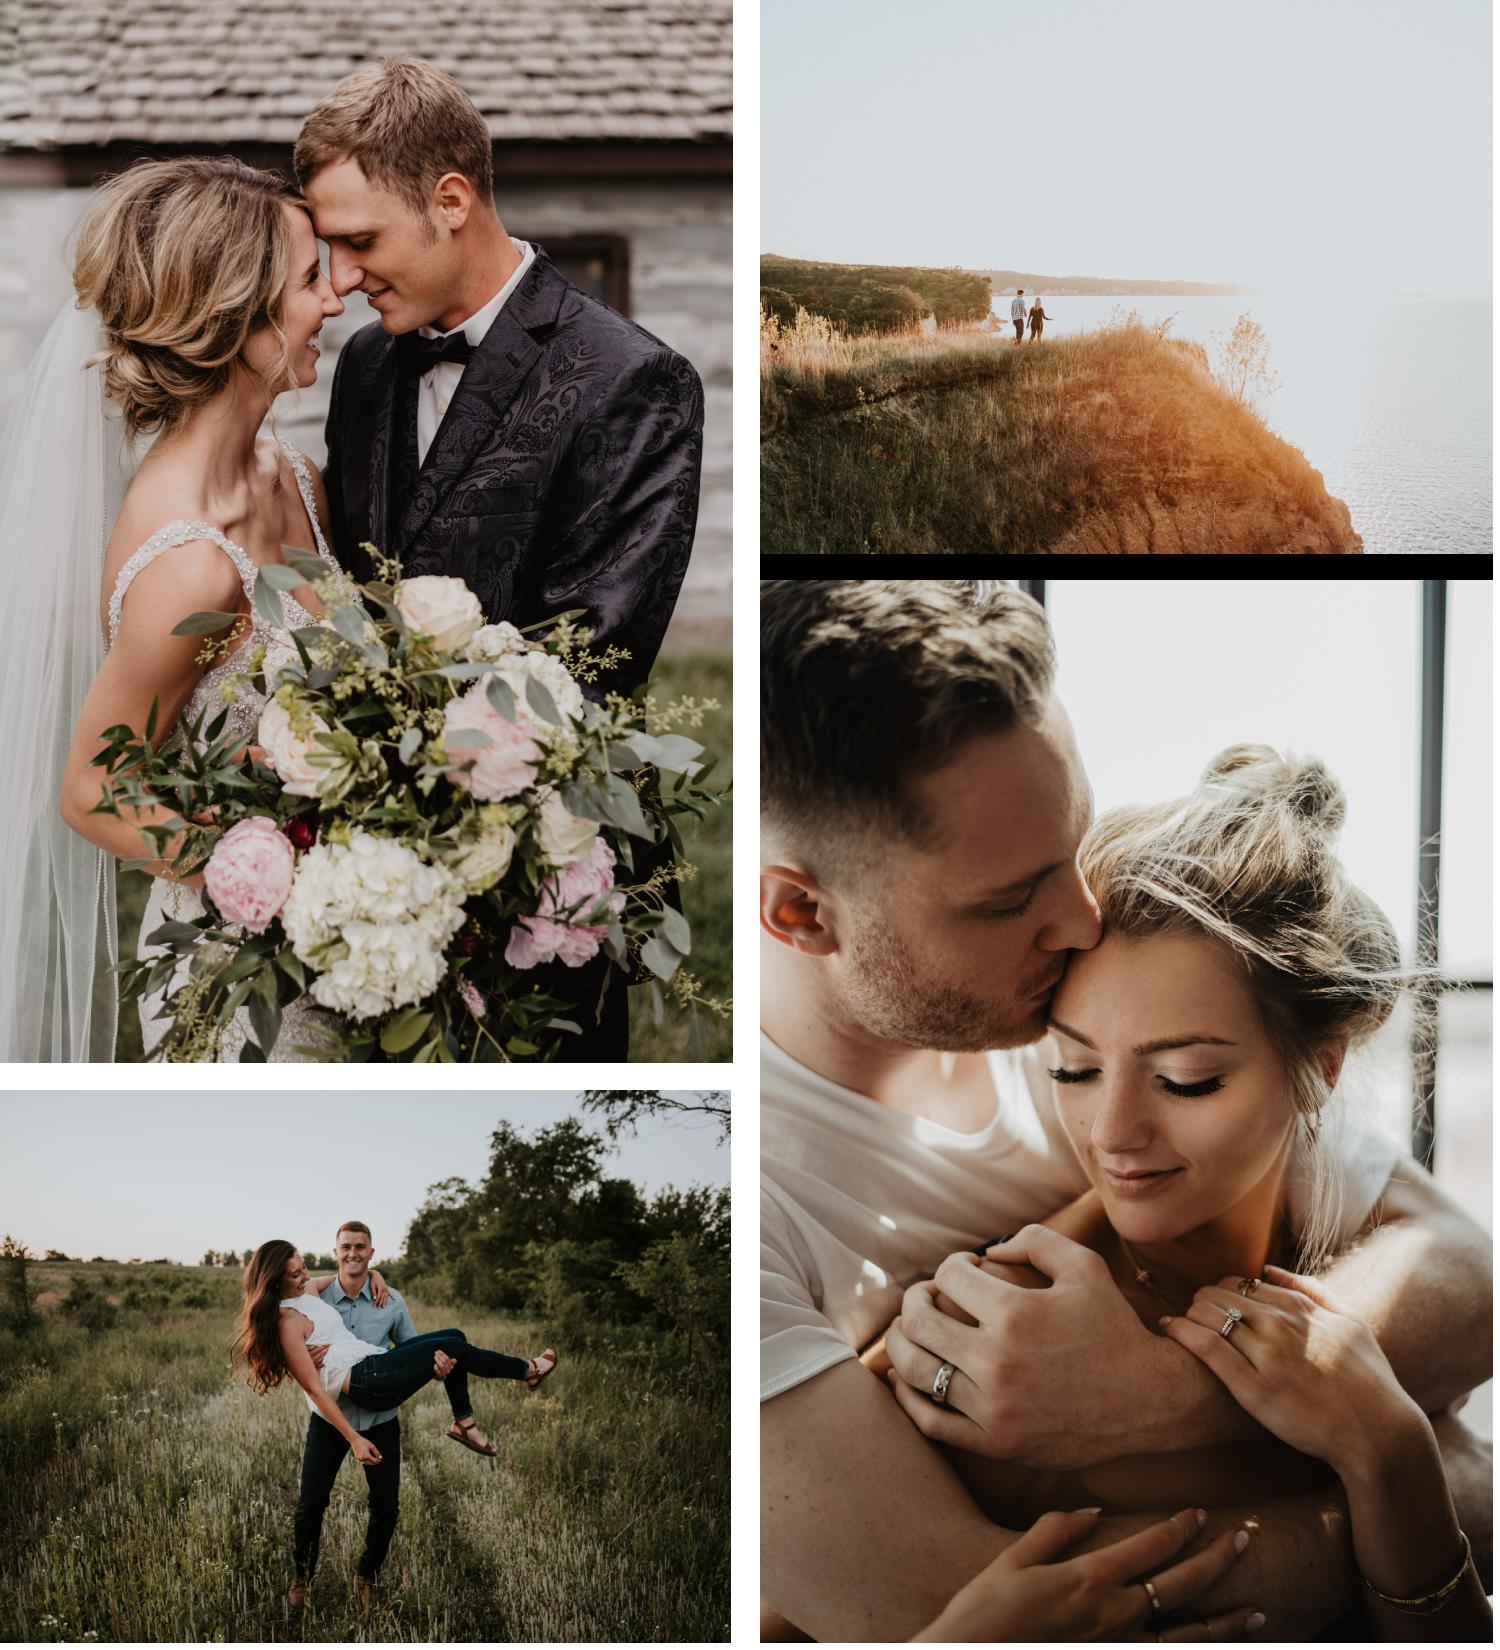 Nebraska Wedding and Engagement Photographer based in Grand Island Kaylie Sirek